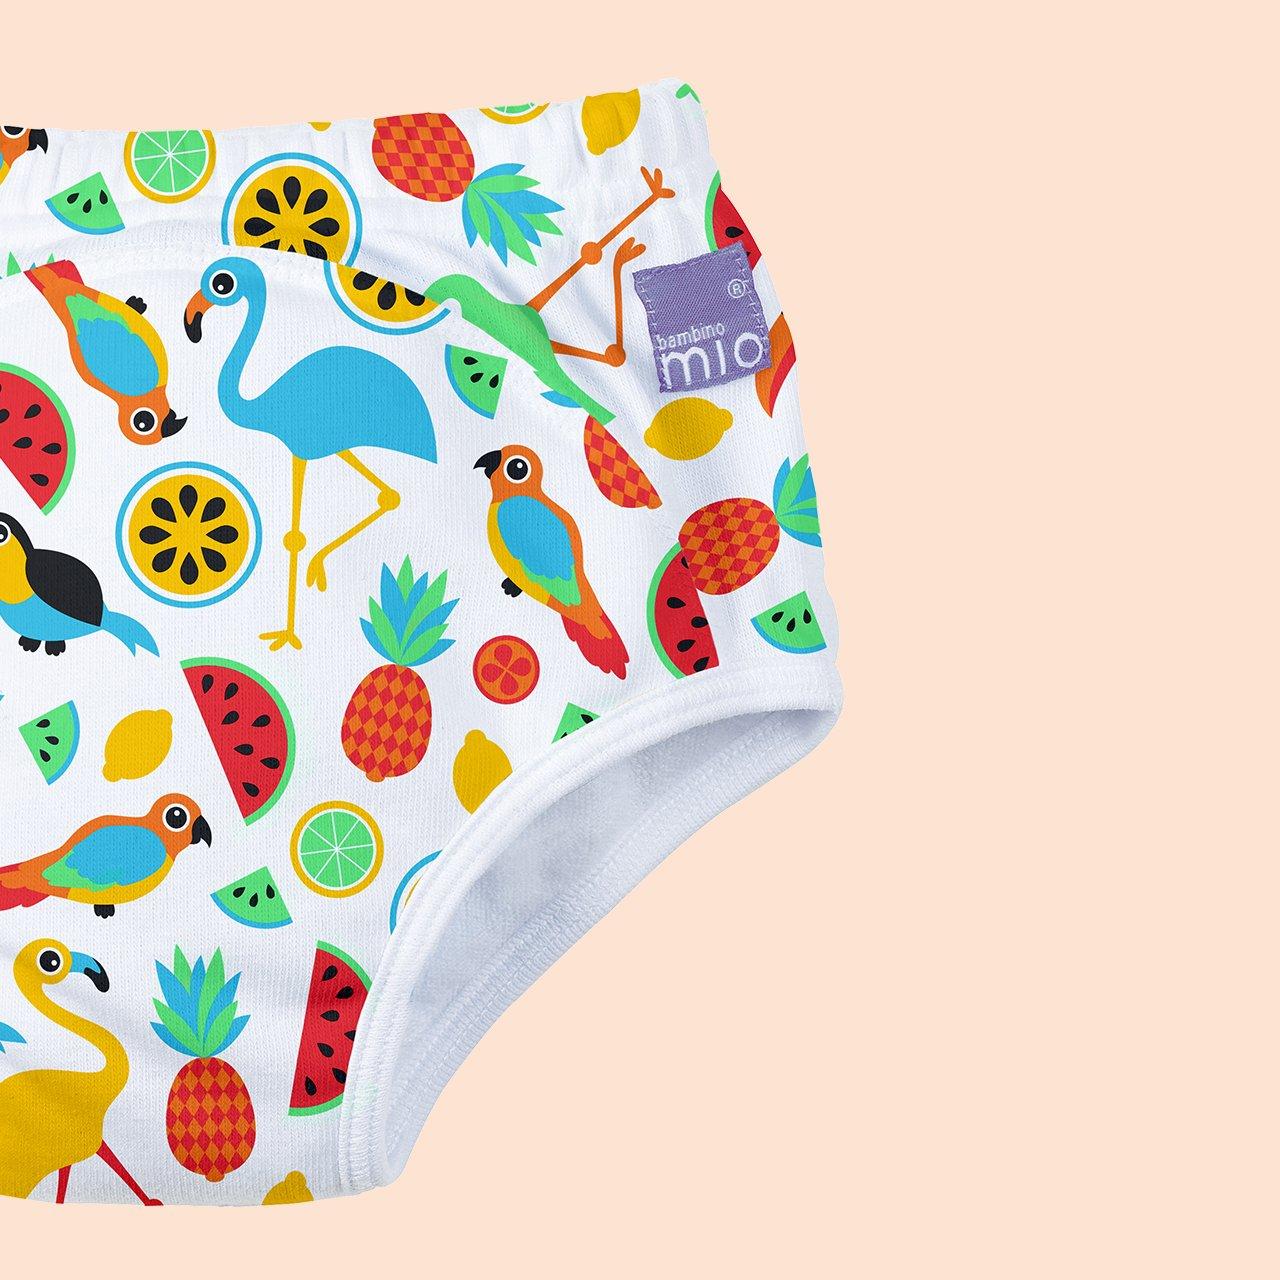 potty training pants Bambino Mio 5 pack mixed boy 2-3 years